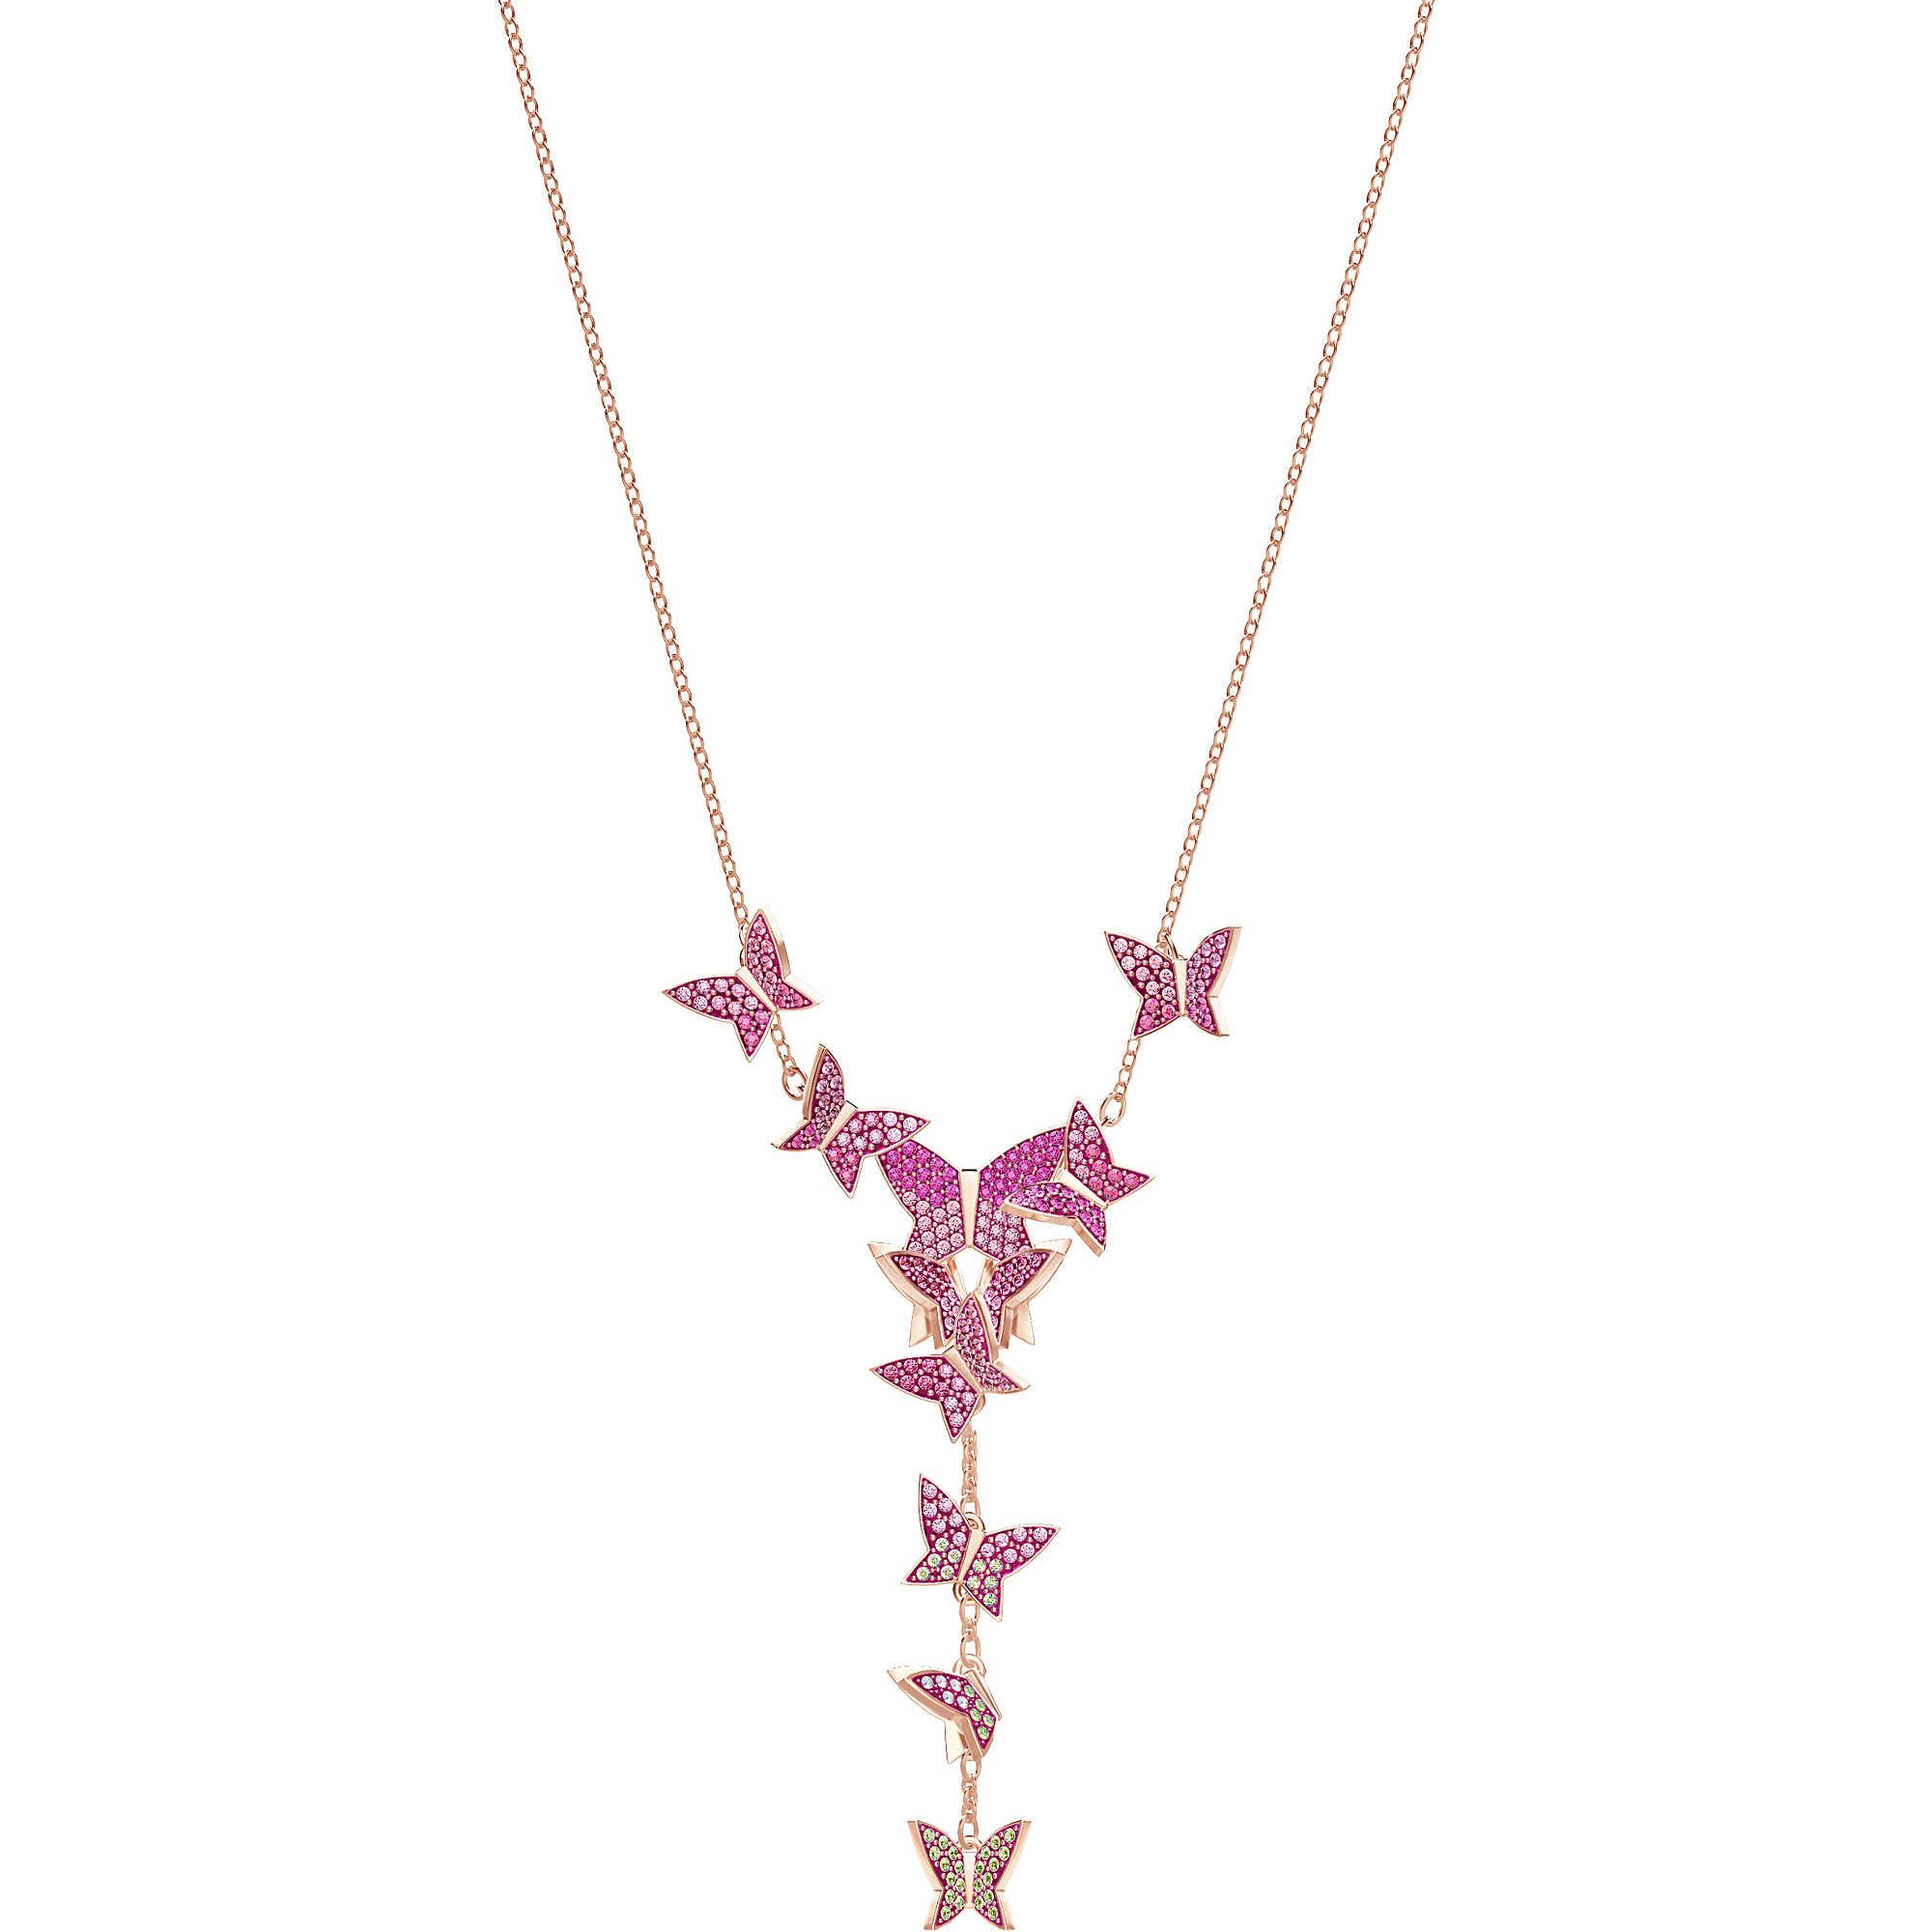 necklace koesia ferrari pendant white jewelry gemstone green gold